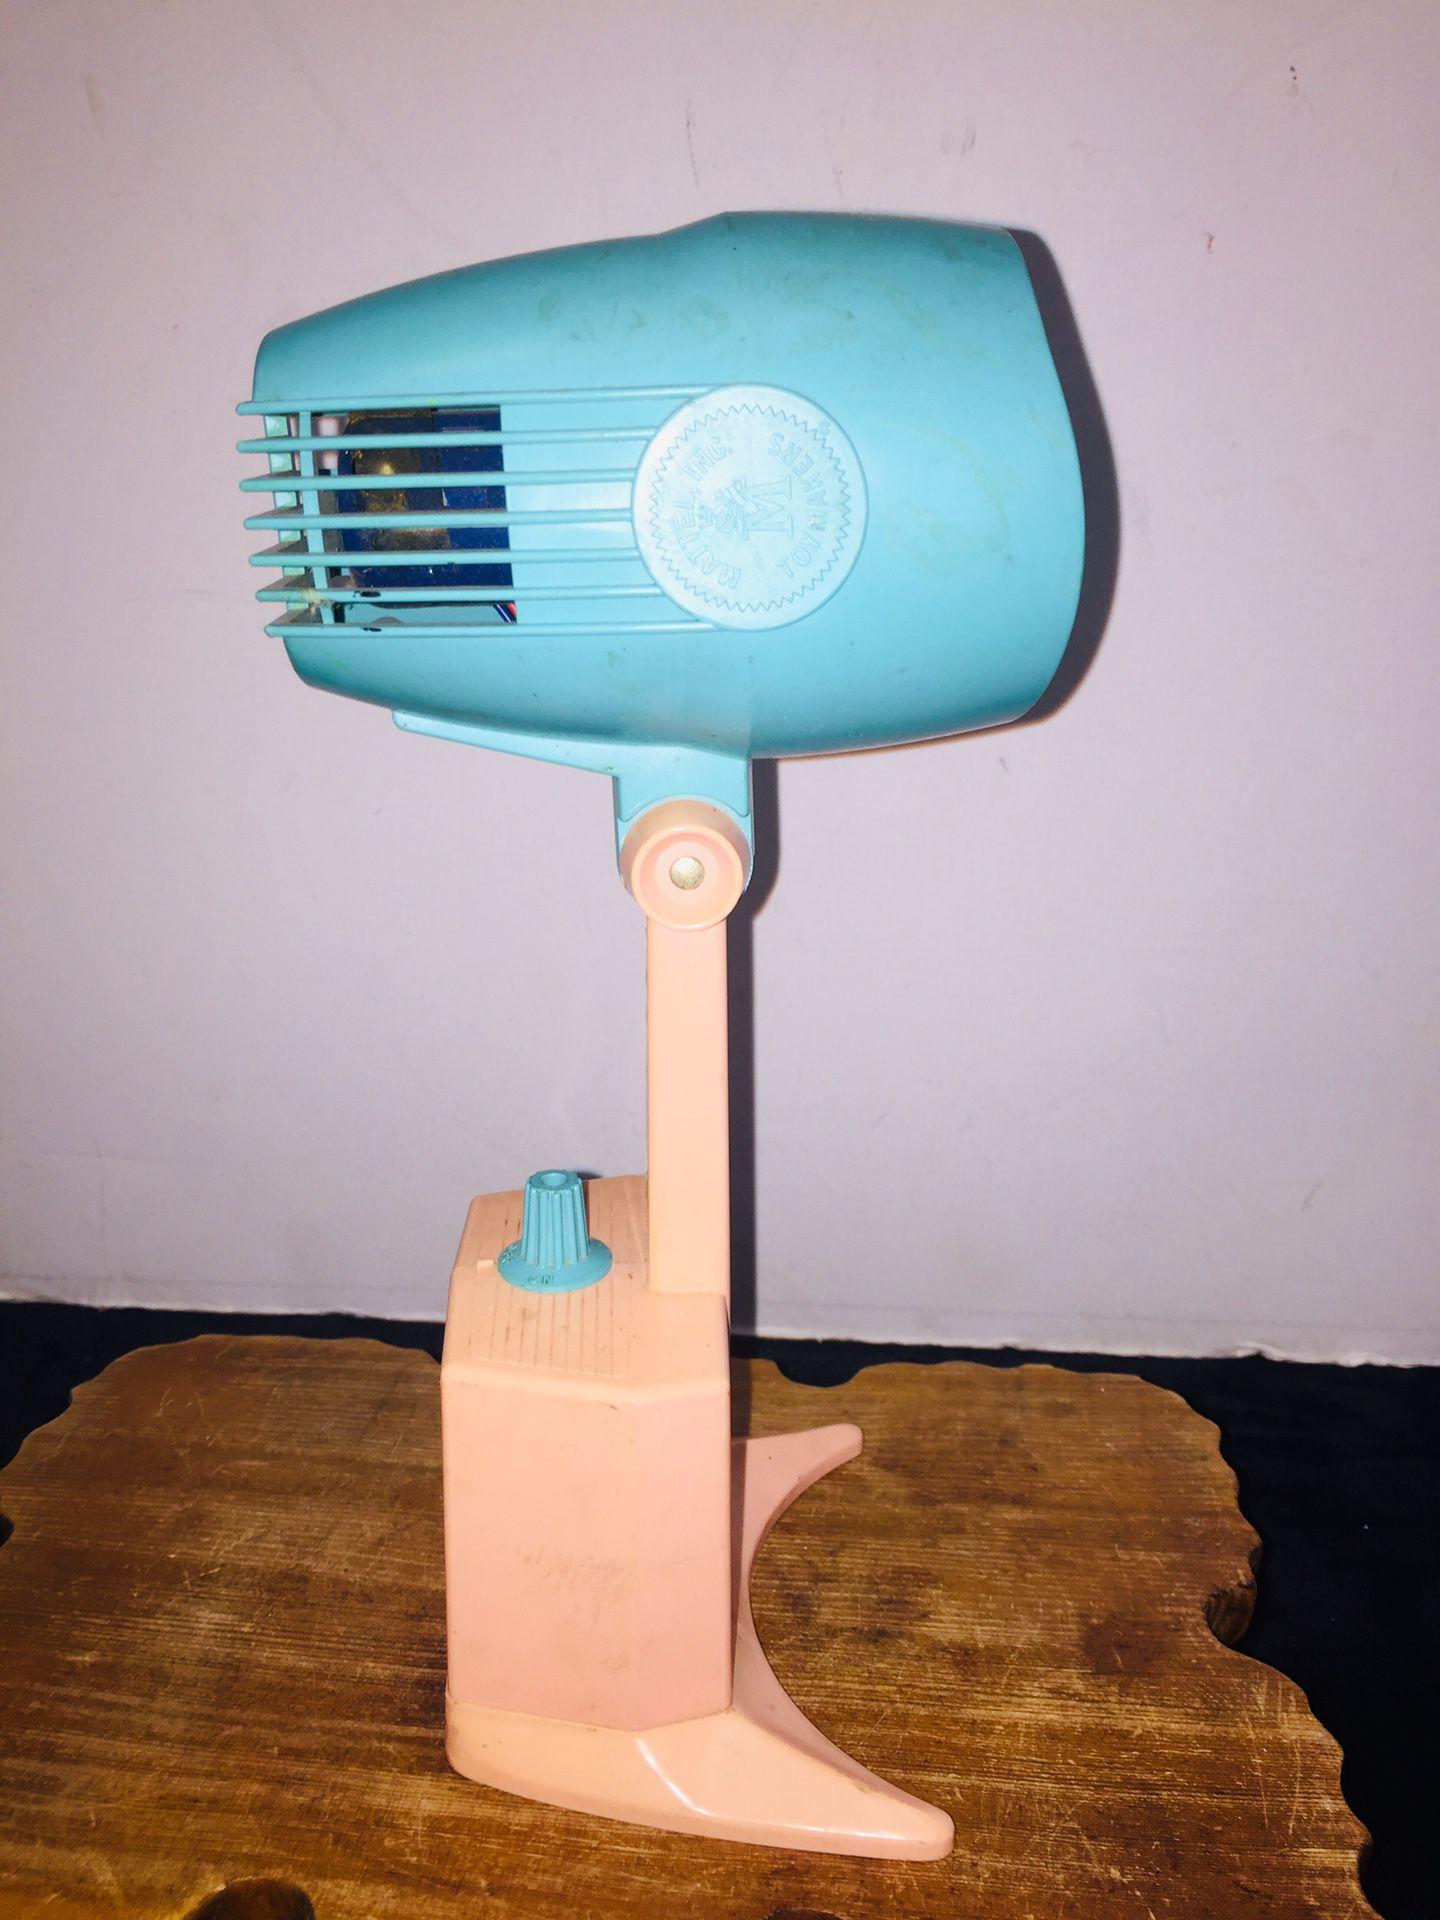 Vintage Mattel Inc. Toys Barbie Toy Hair Dryer